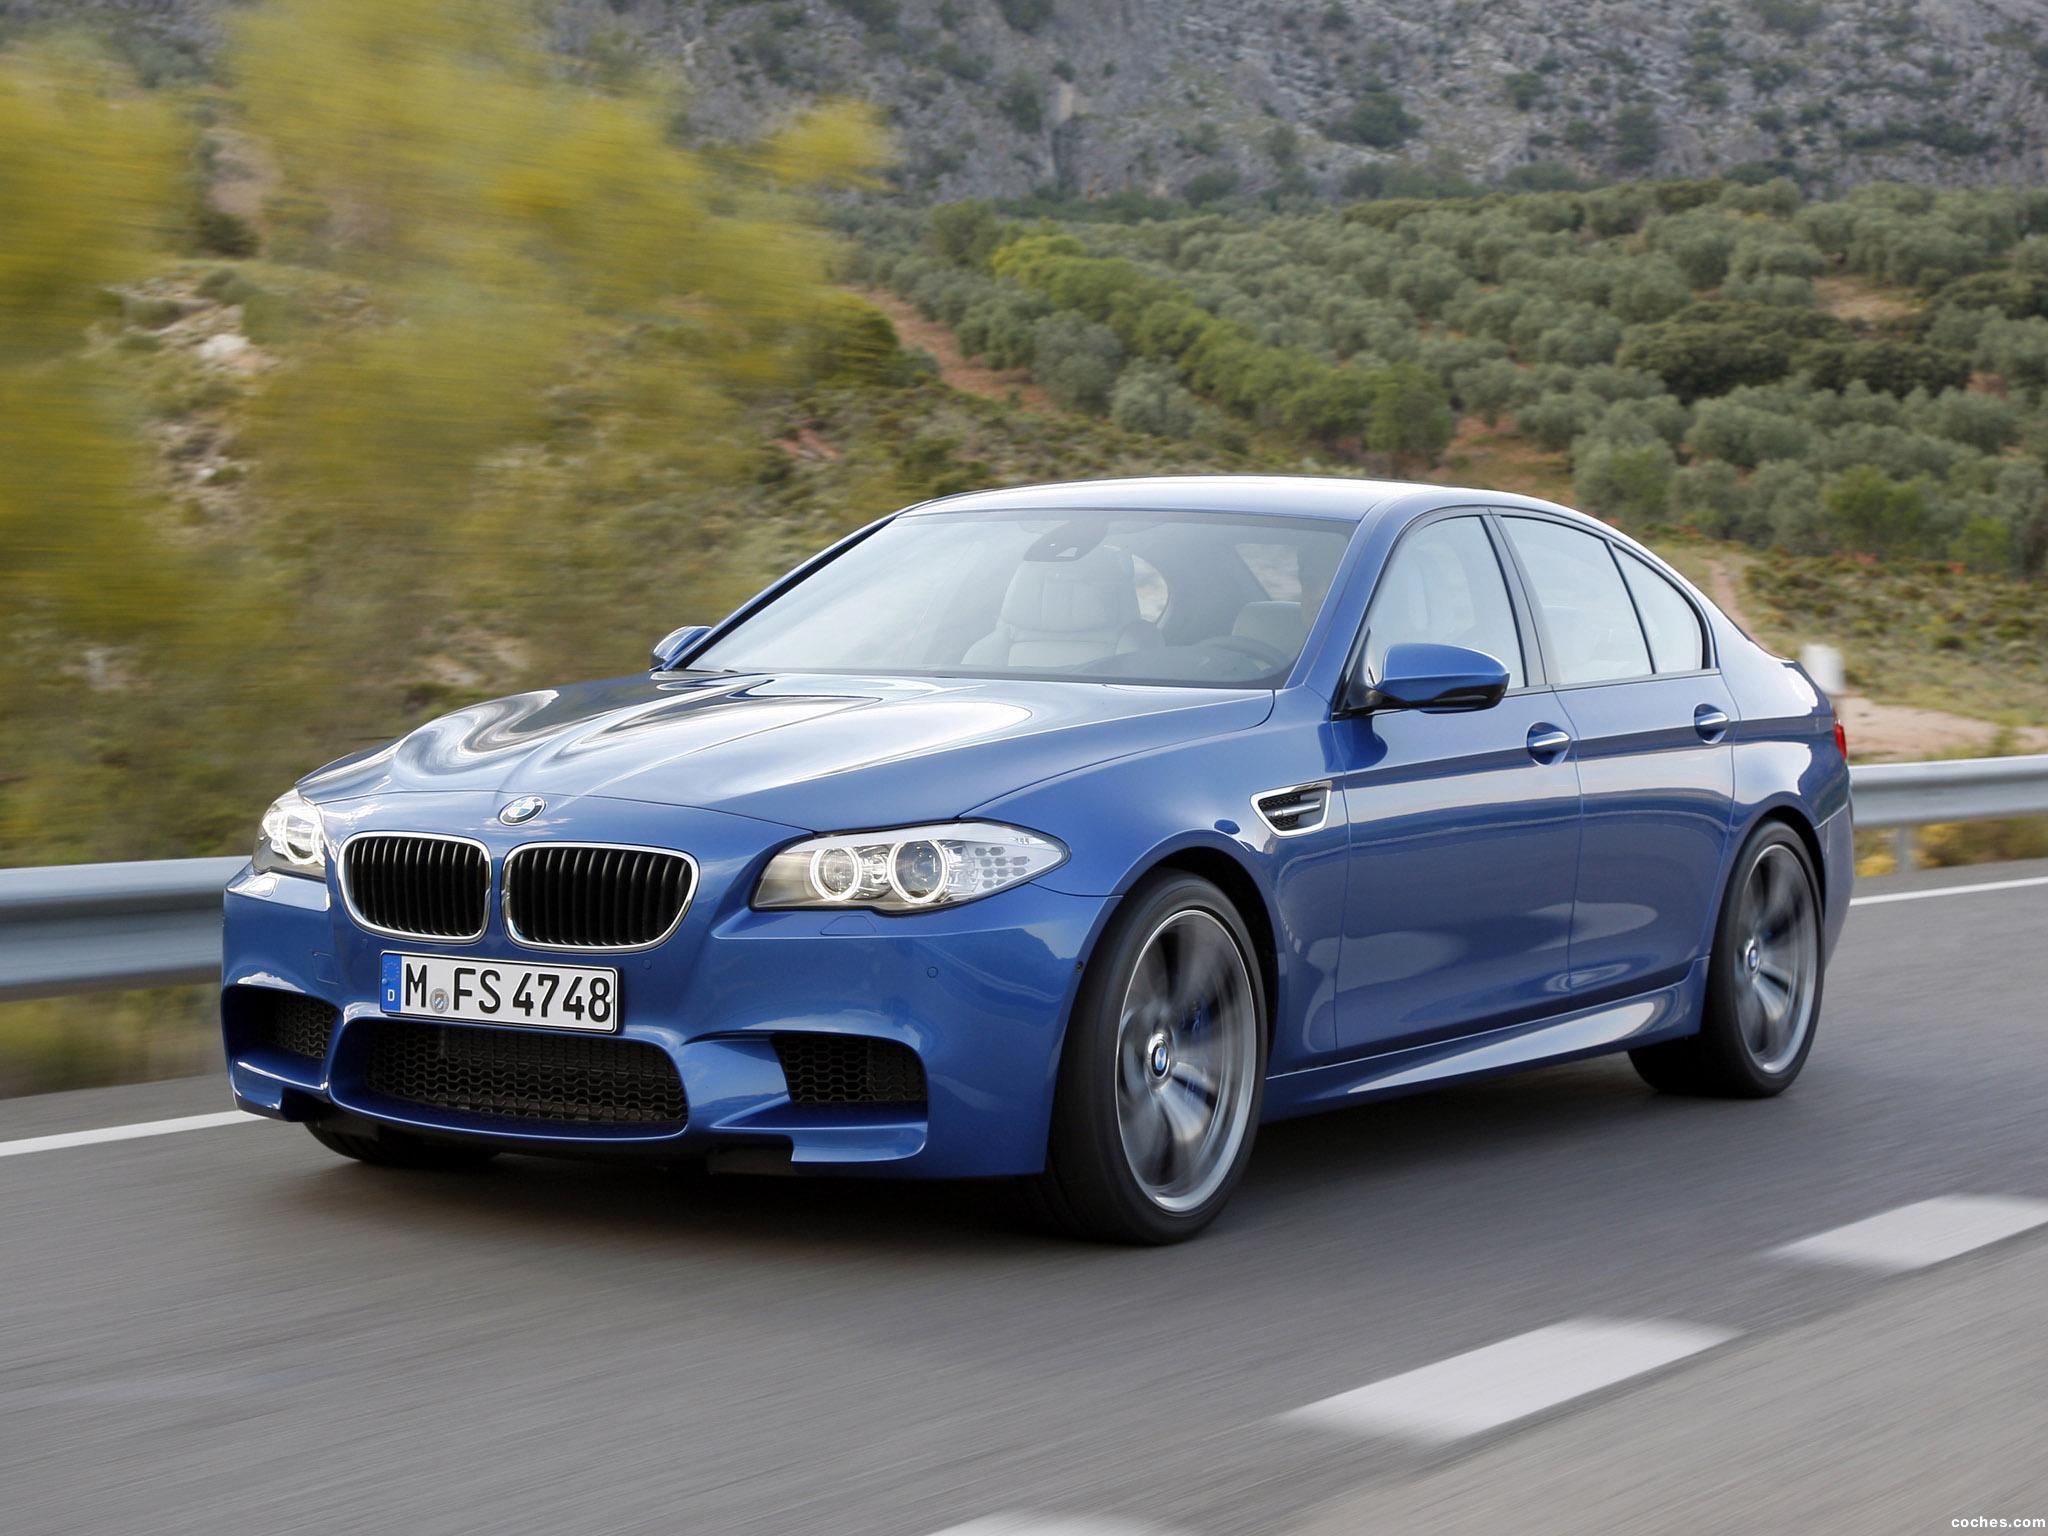 Foto 0 de BMW M5 Sedan F10 2011